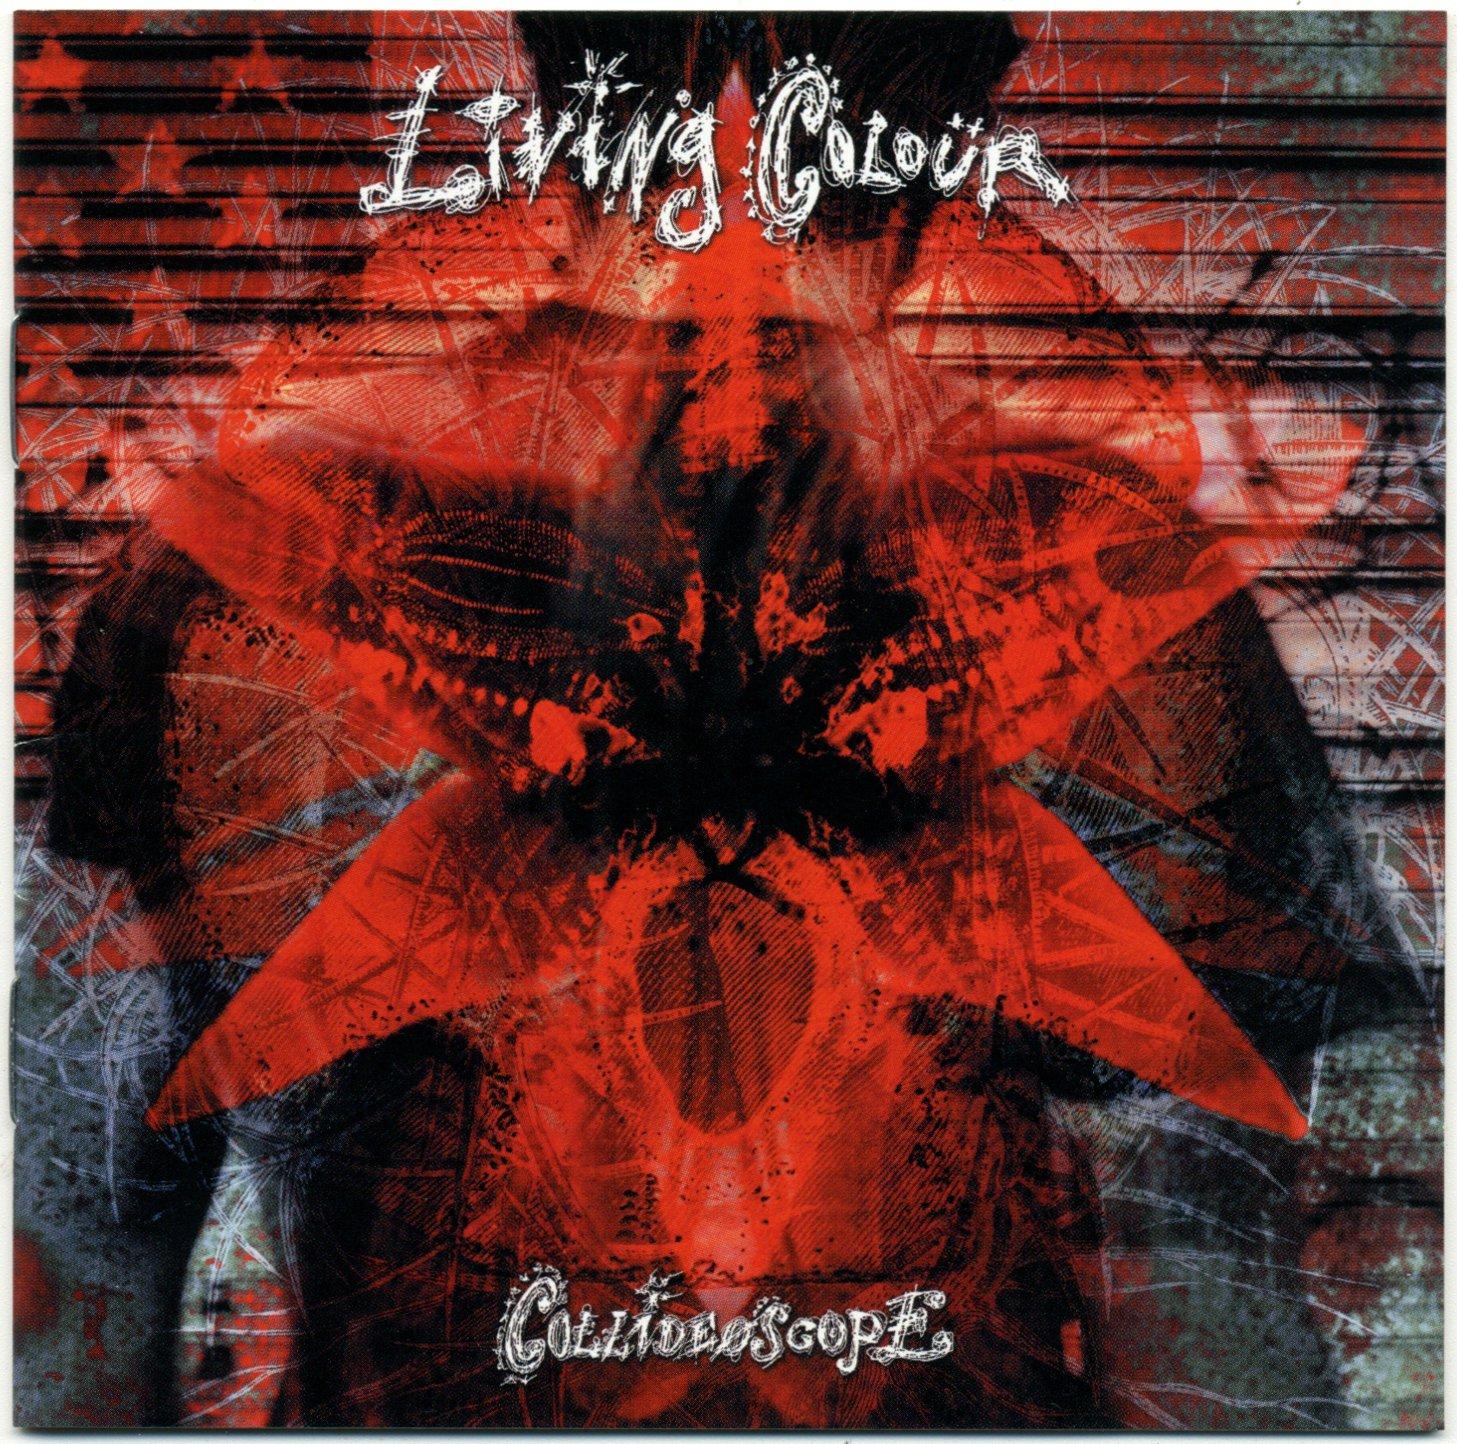 Living Colour Collideoscope CD